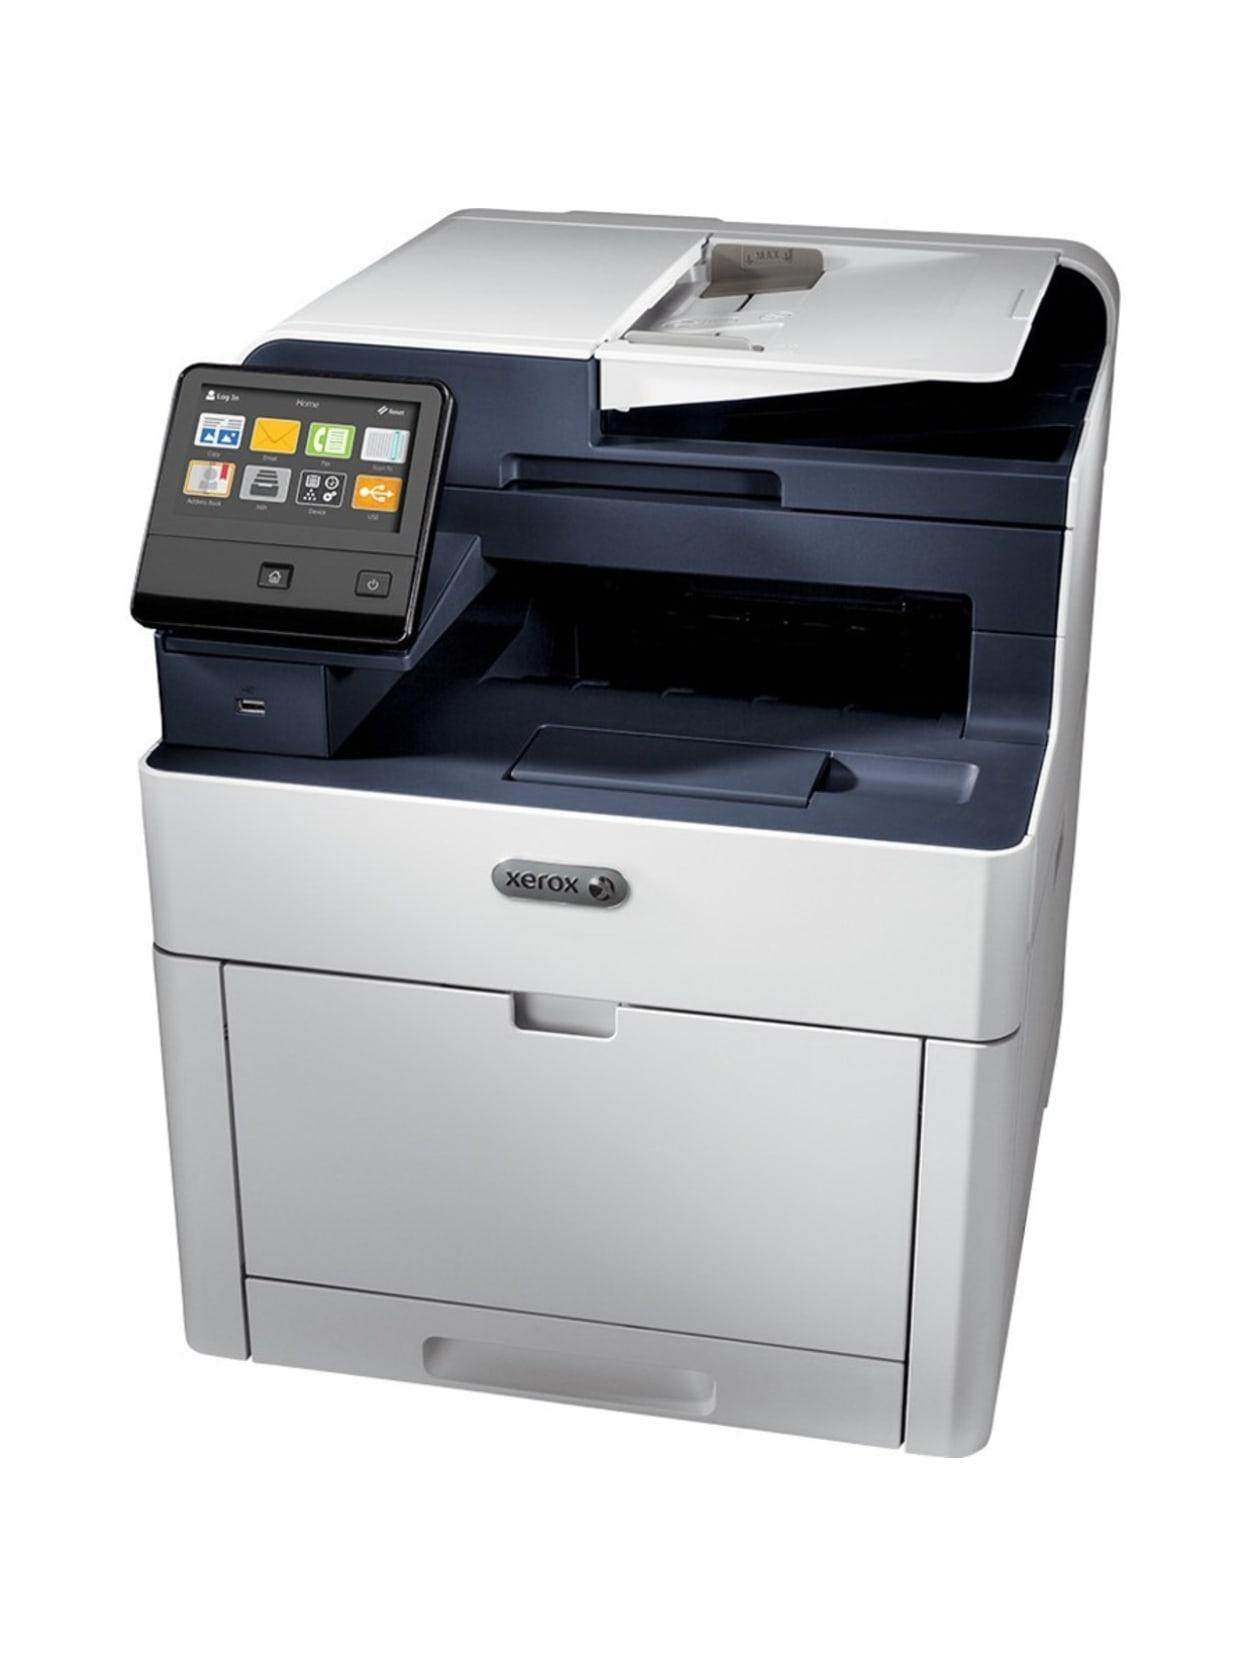 Xerox Workcentre 6515dn Laser All In